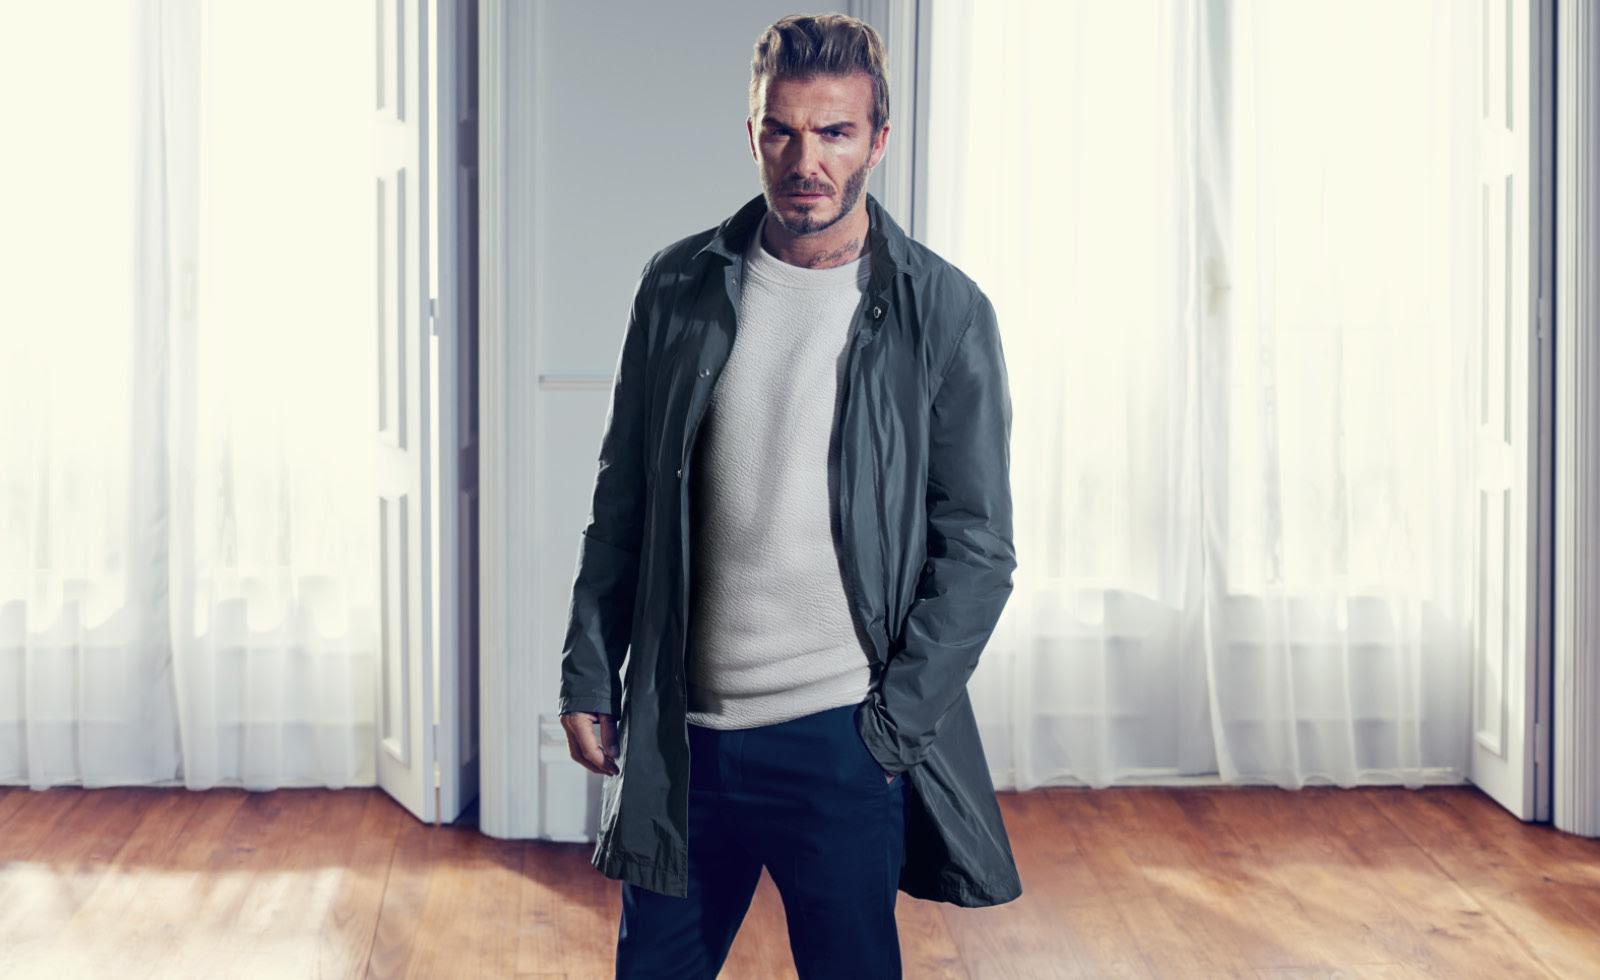 David Beckham - The Knitted Sweater